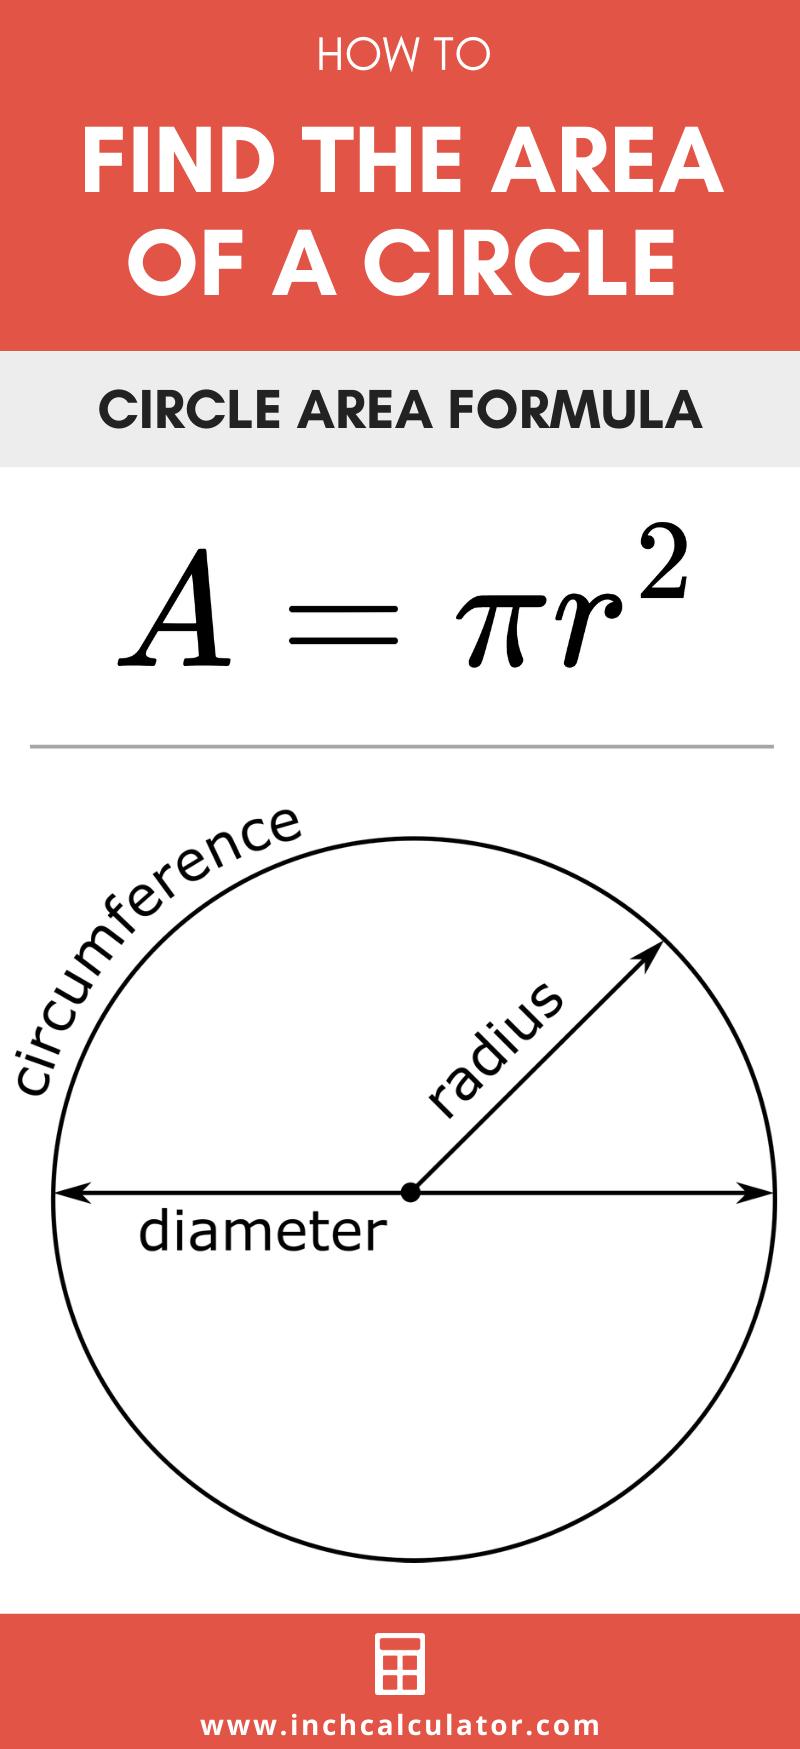 Share area of a circle calculator